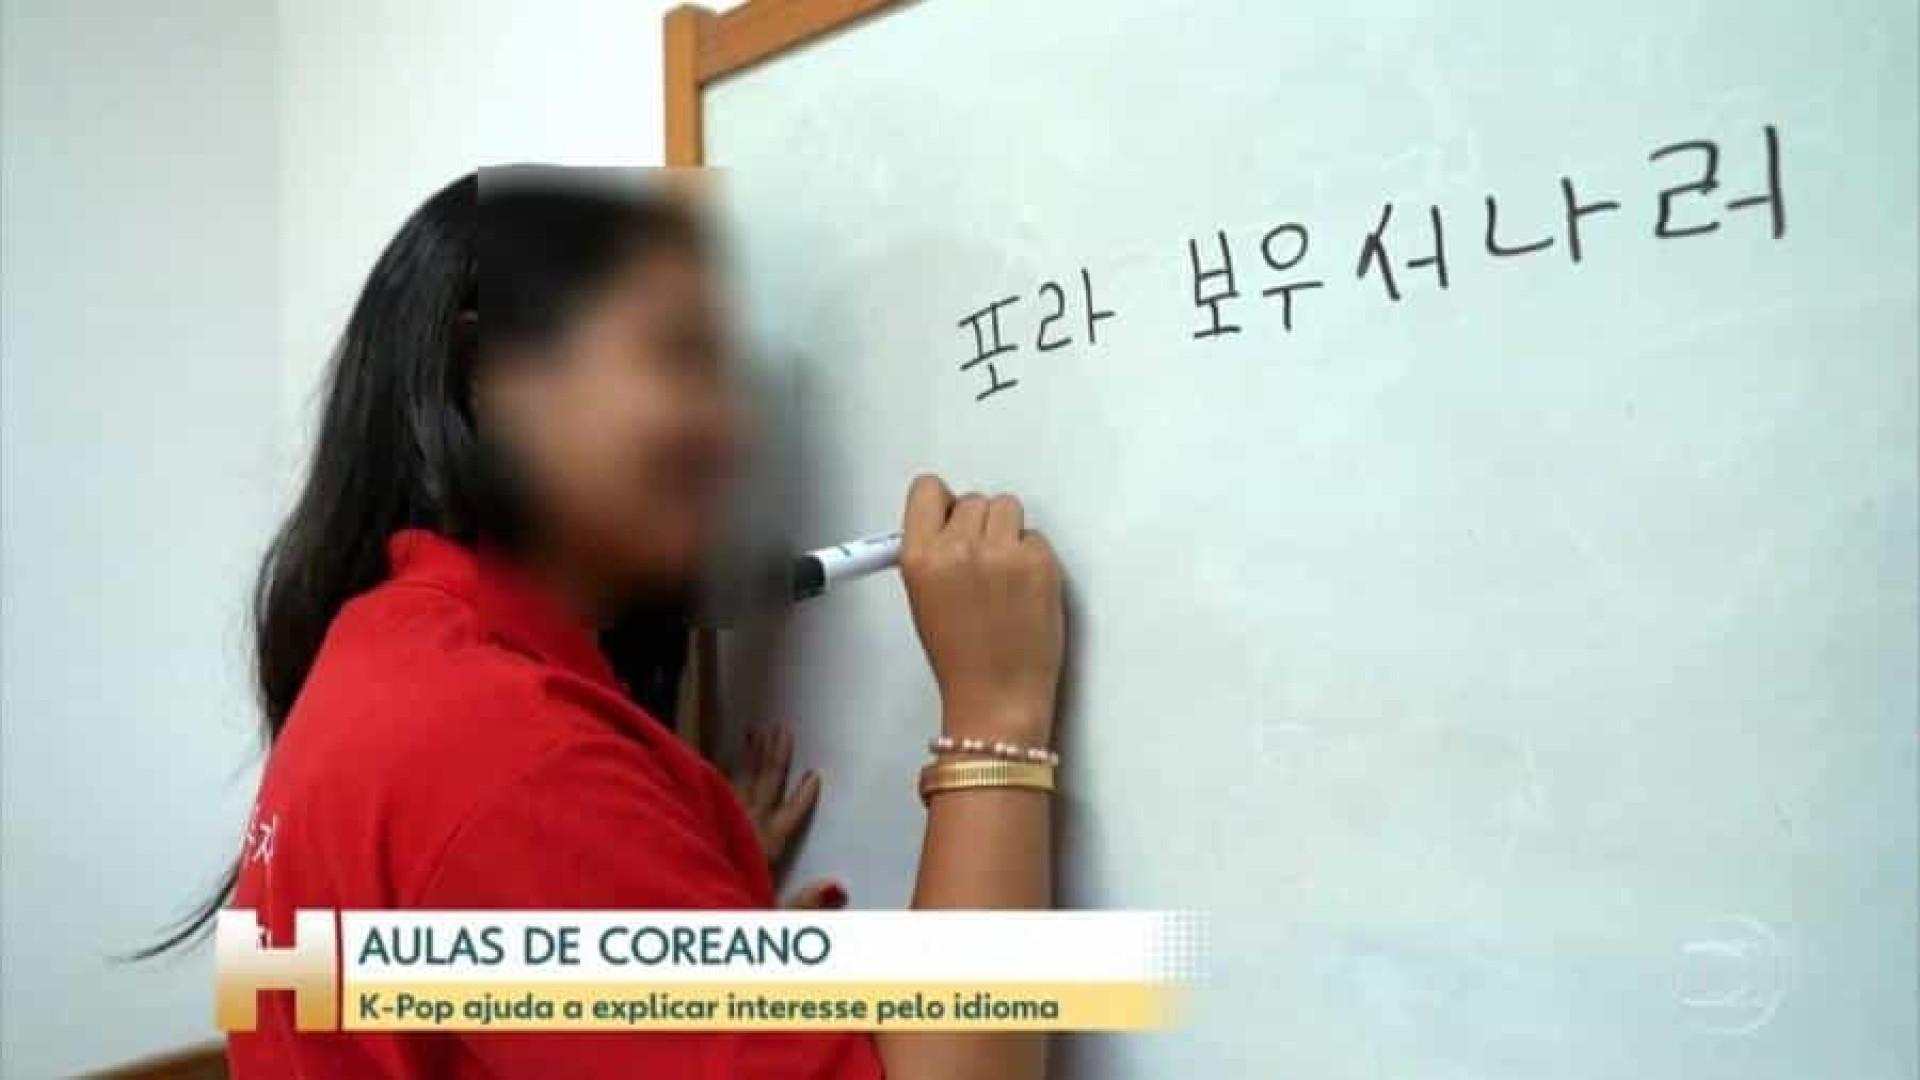 Protesto em coreano contra Bolsonaro na Globo viraliza